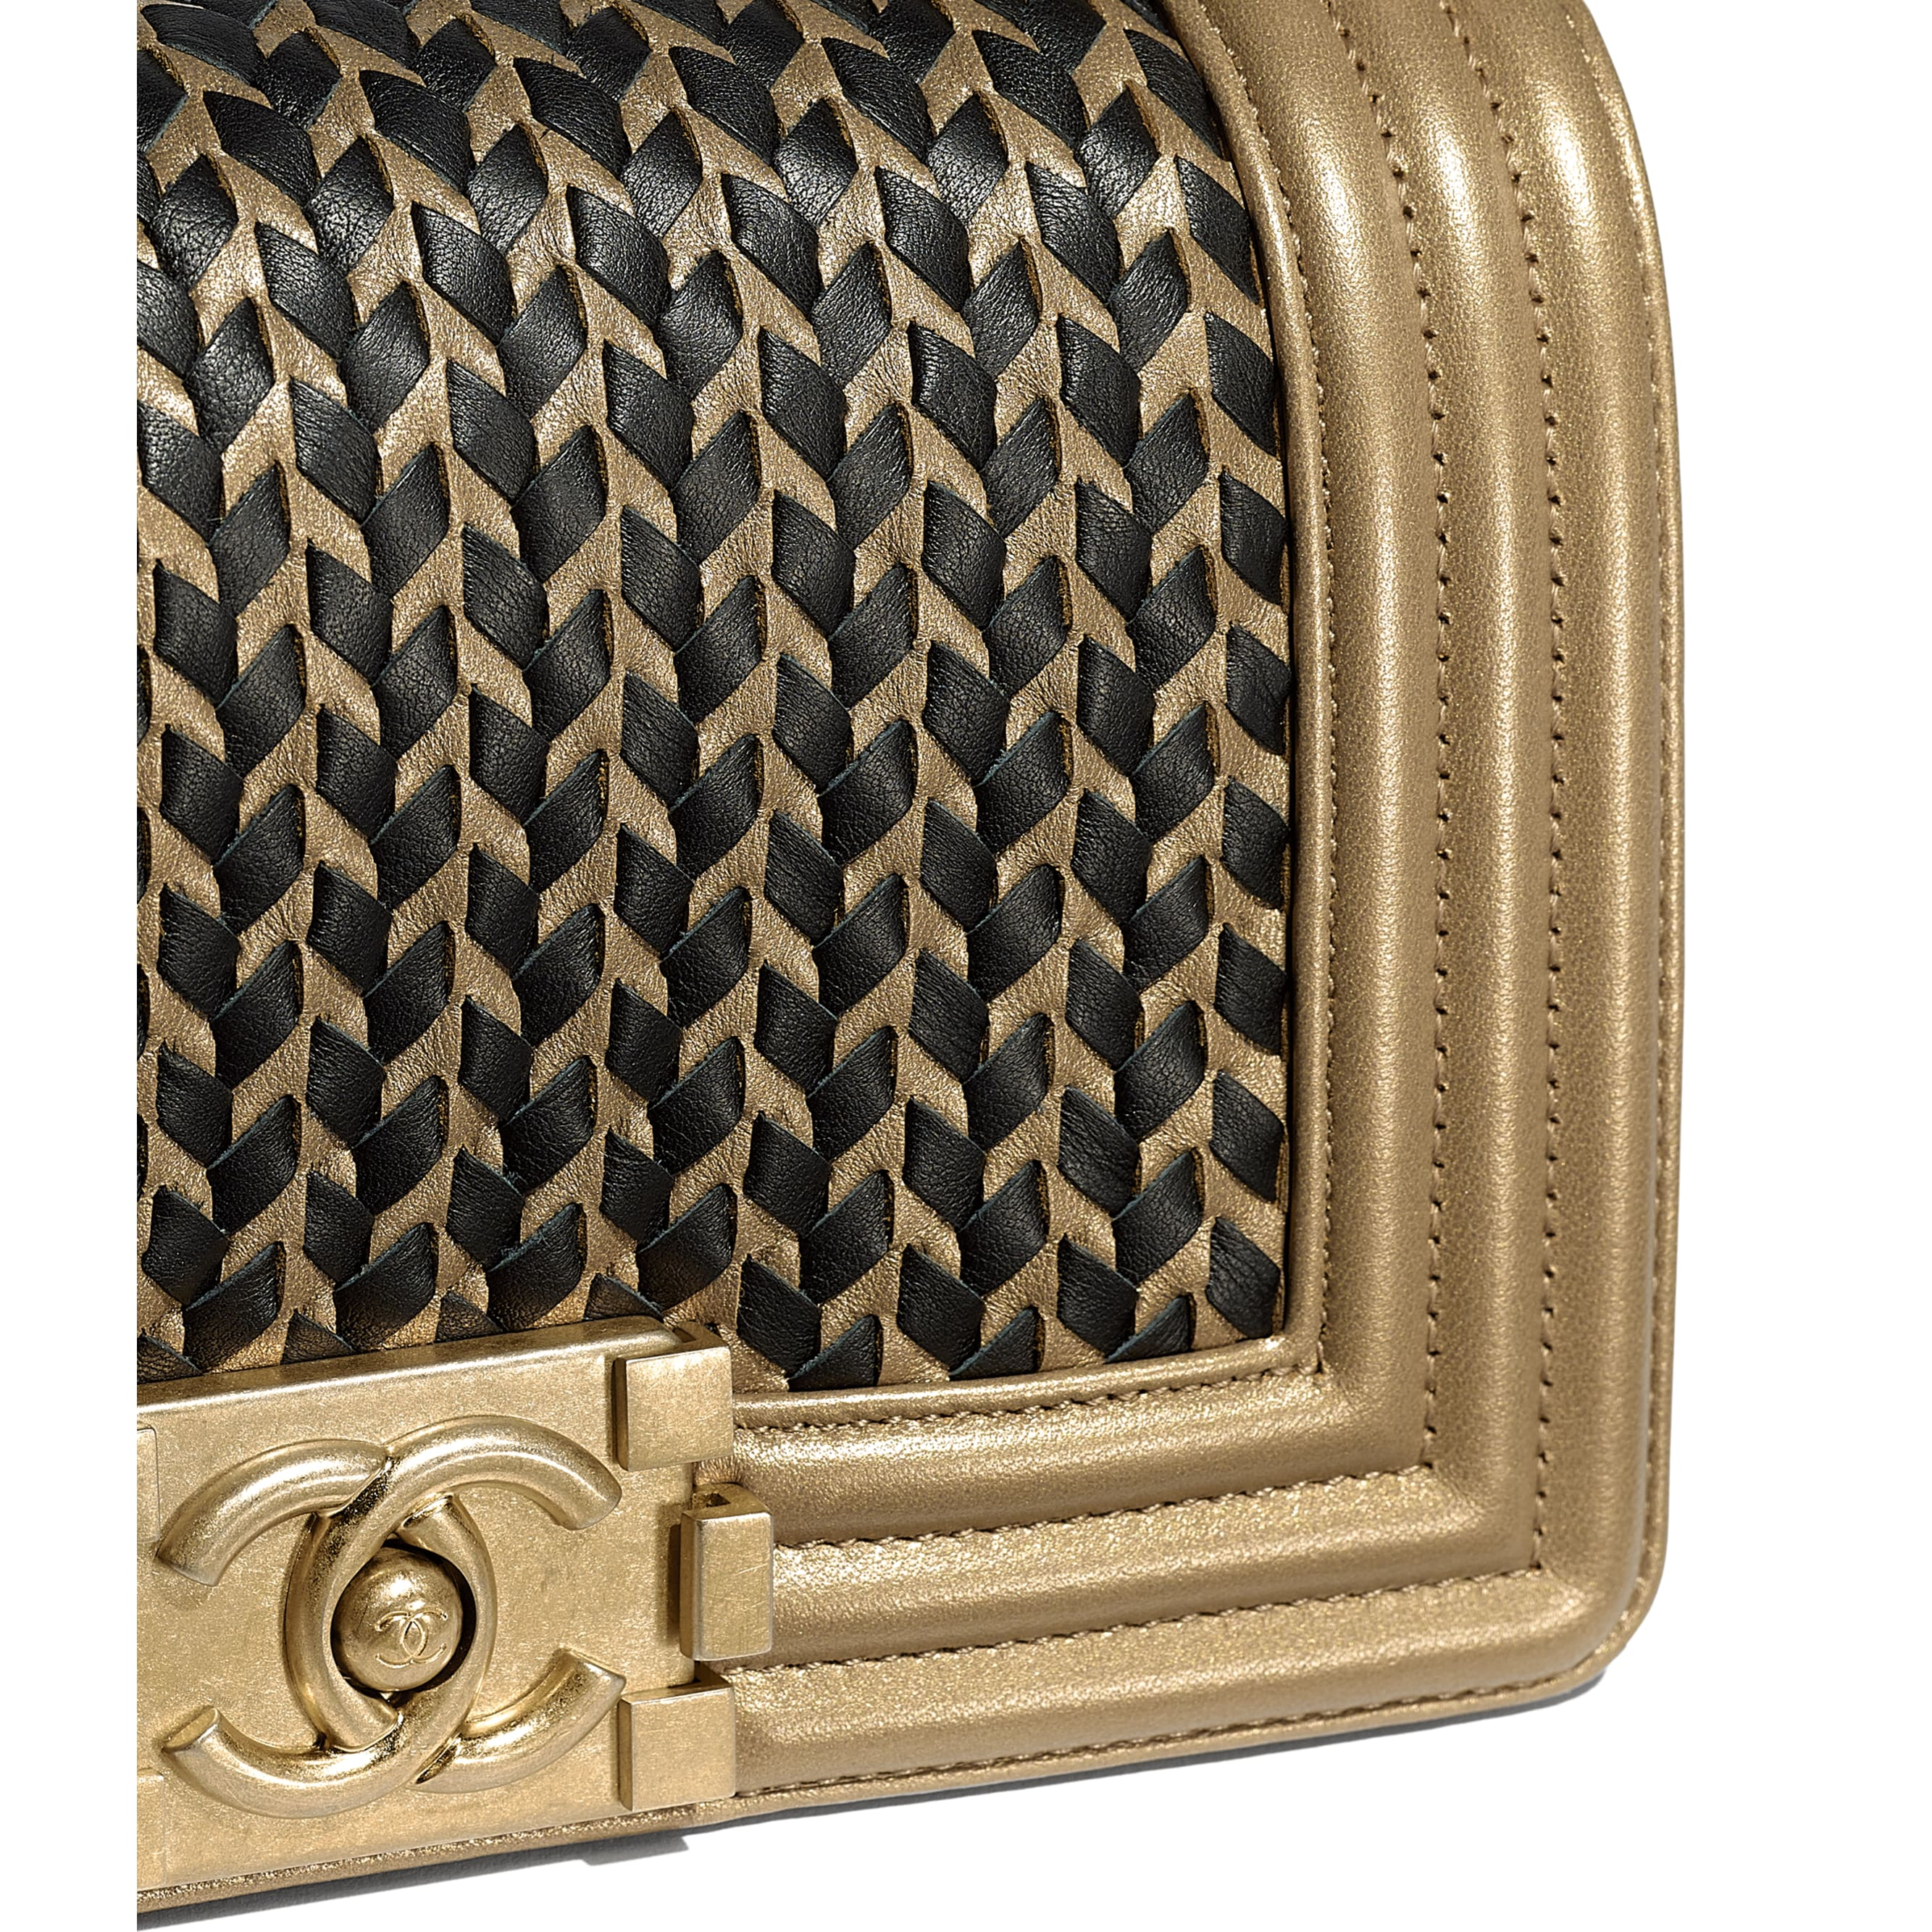 Small BOY CHANEL Handbag - Gold & Black - Metallic Lambskin & Gold Metal - CHANEL - Extra view - see standard sized version